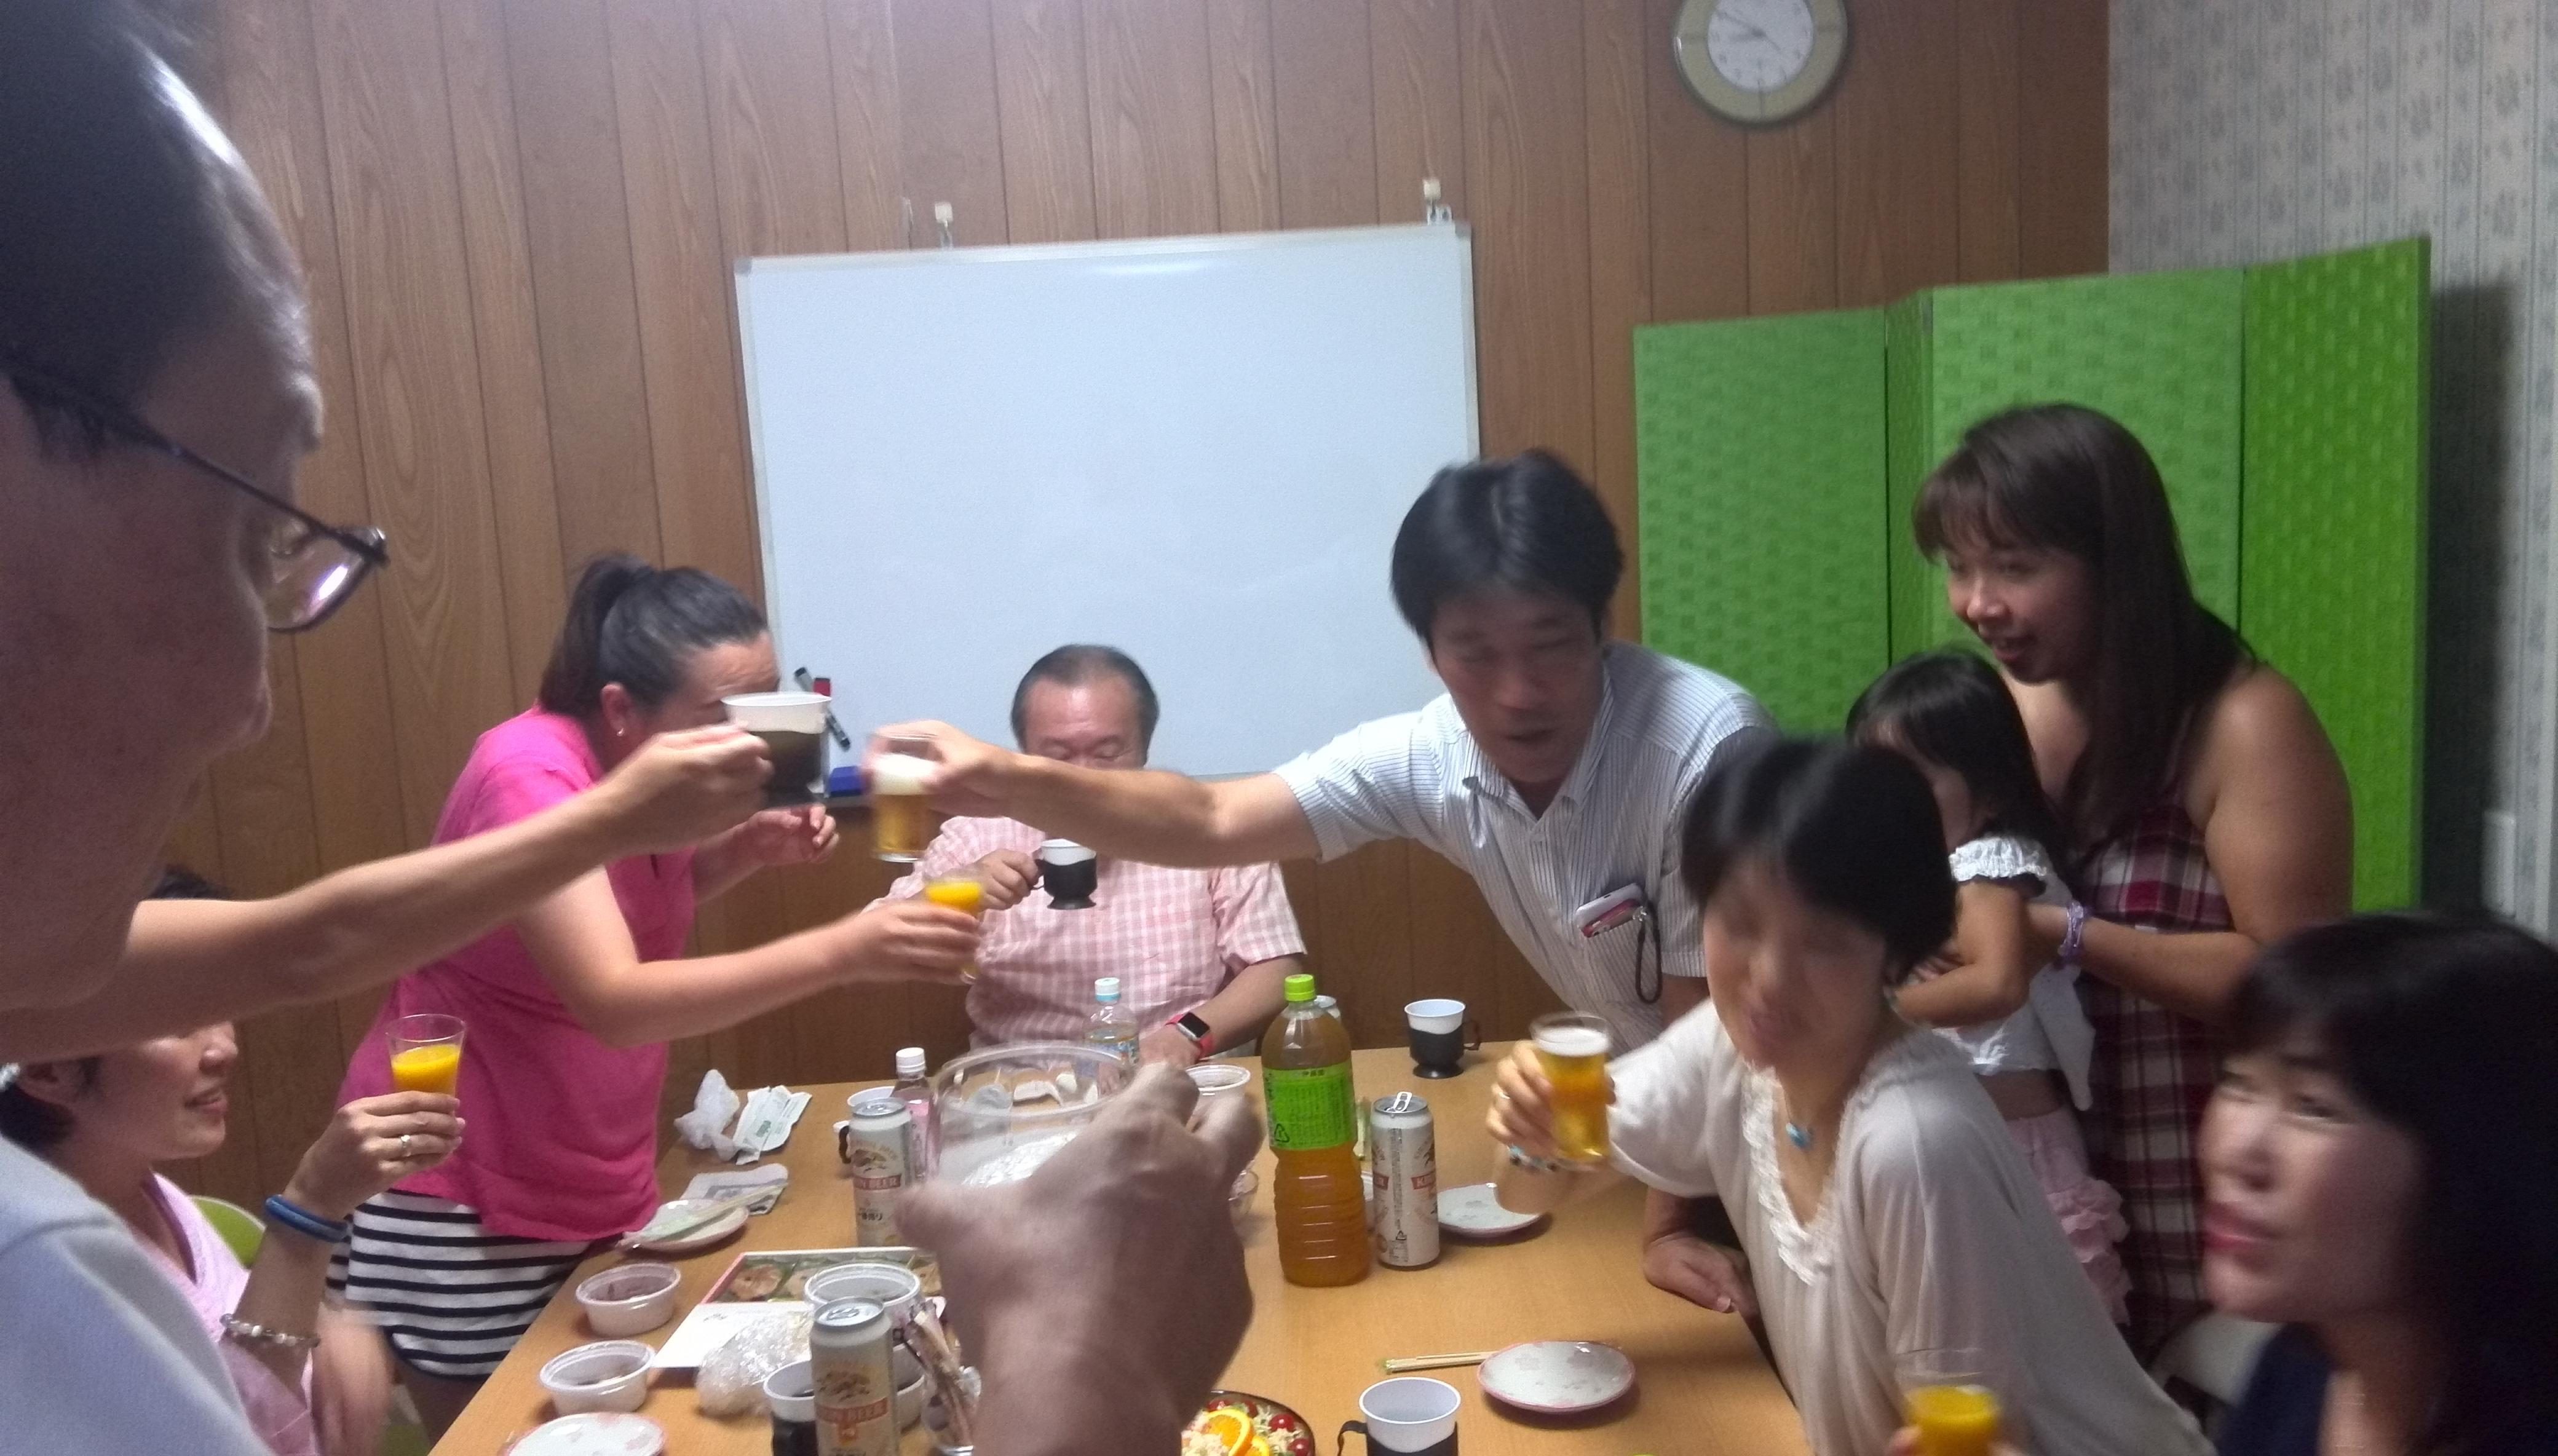 IMG 20150806 204953 - 池川先生から教えて頂いた令和の時代の生き方